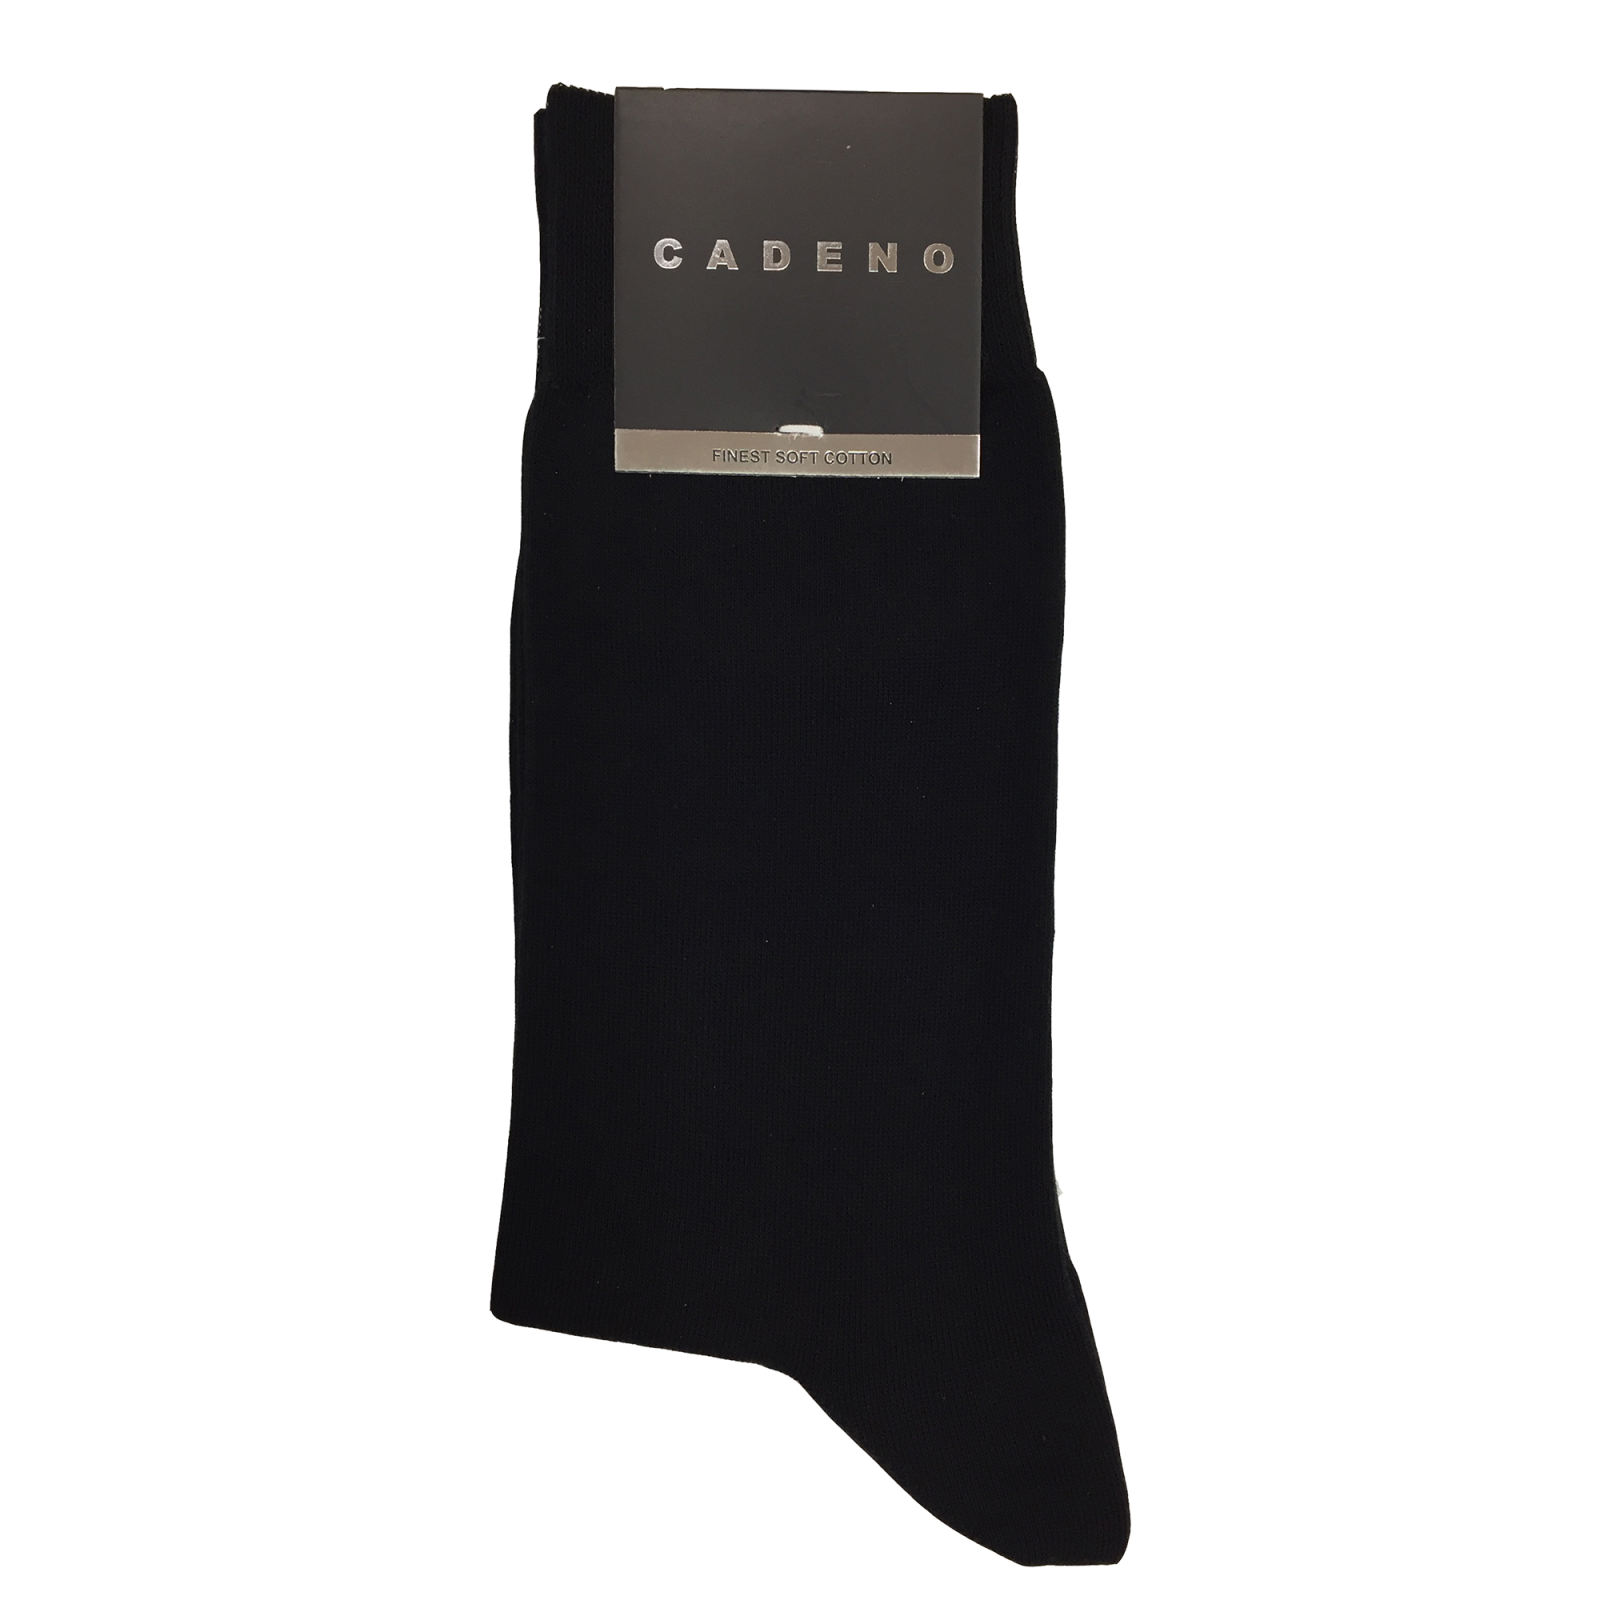 جوراب مردانه کادنو کد CA1090 بسته 3 عددی -  - 3